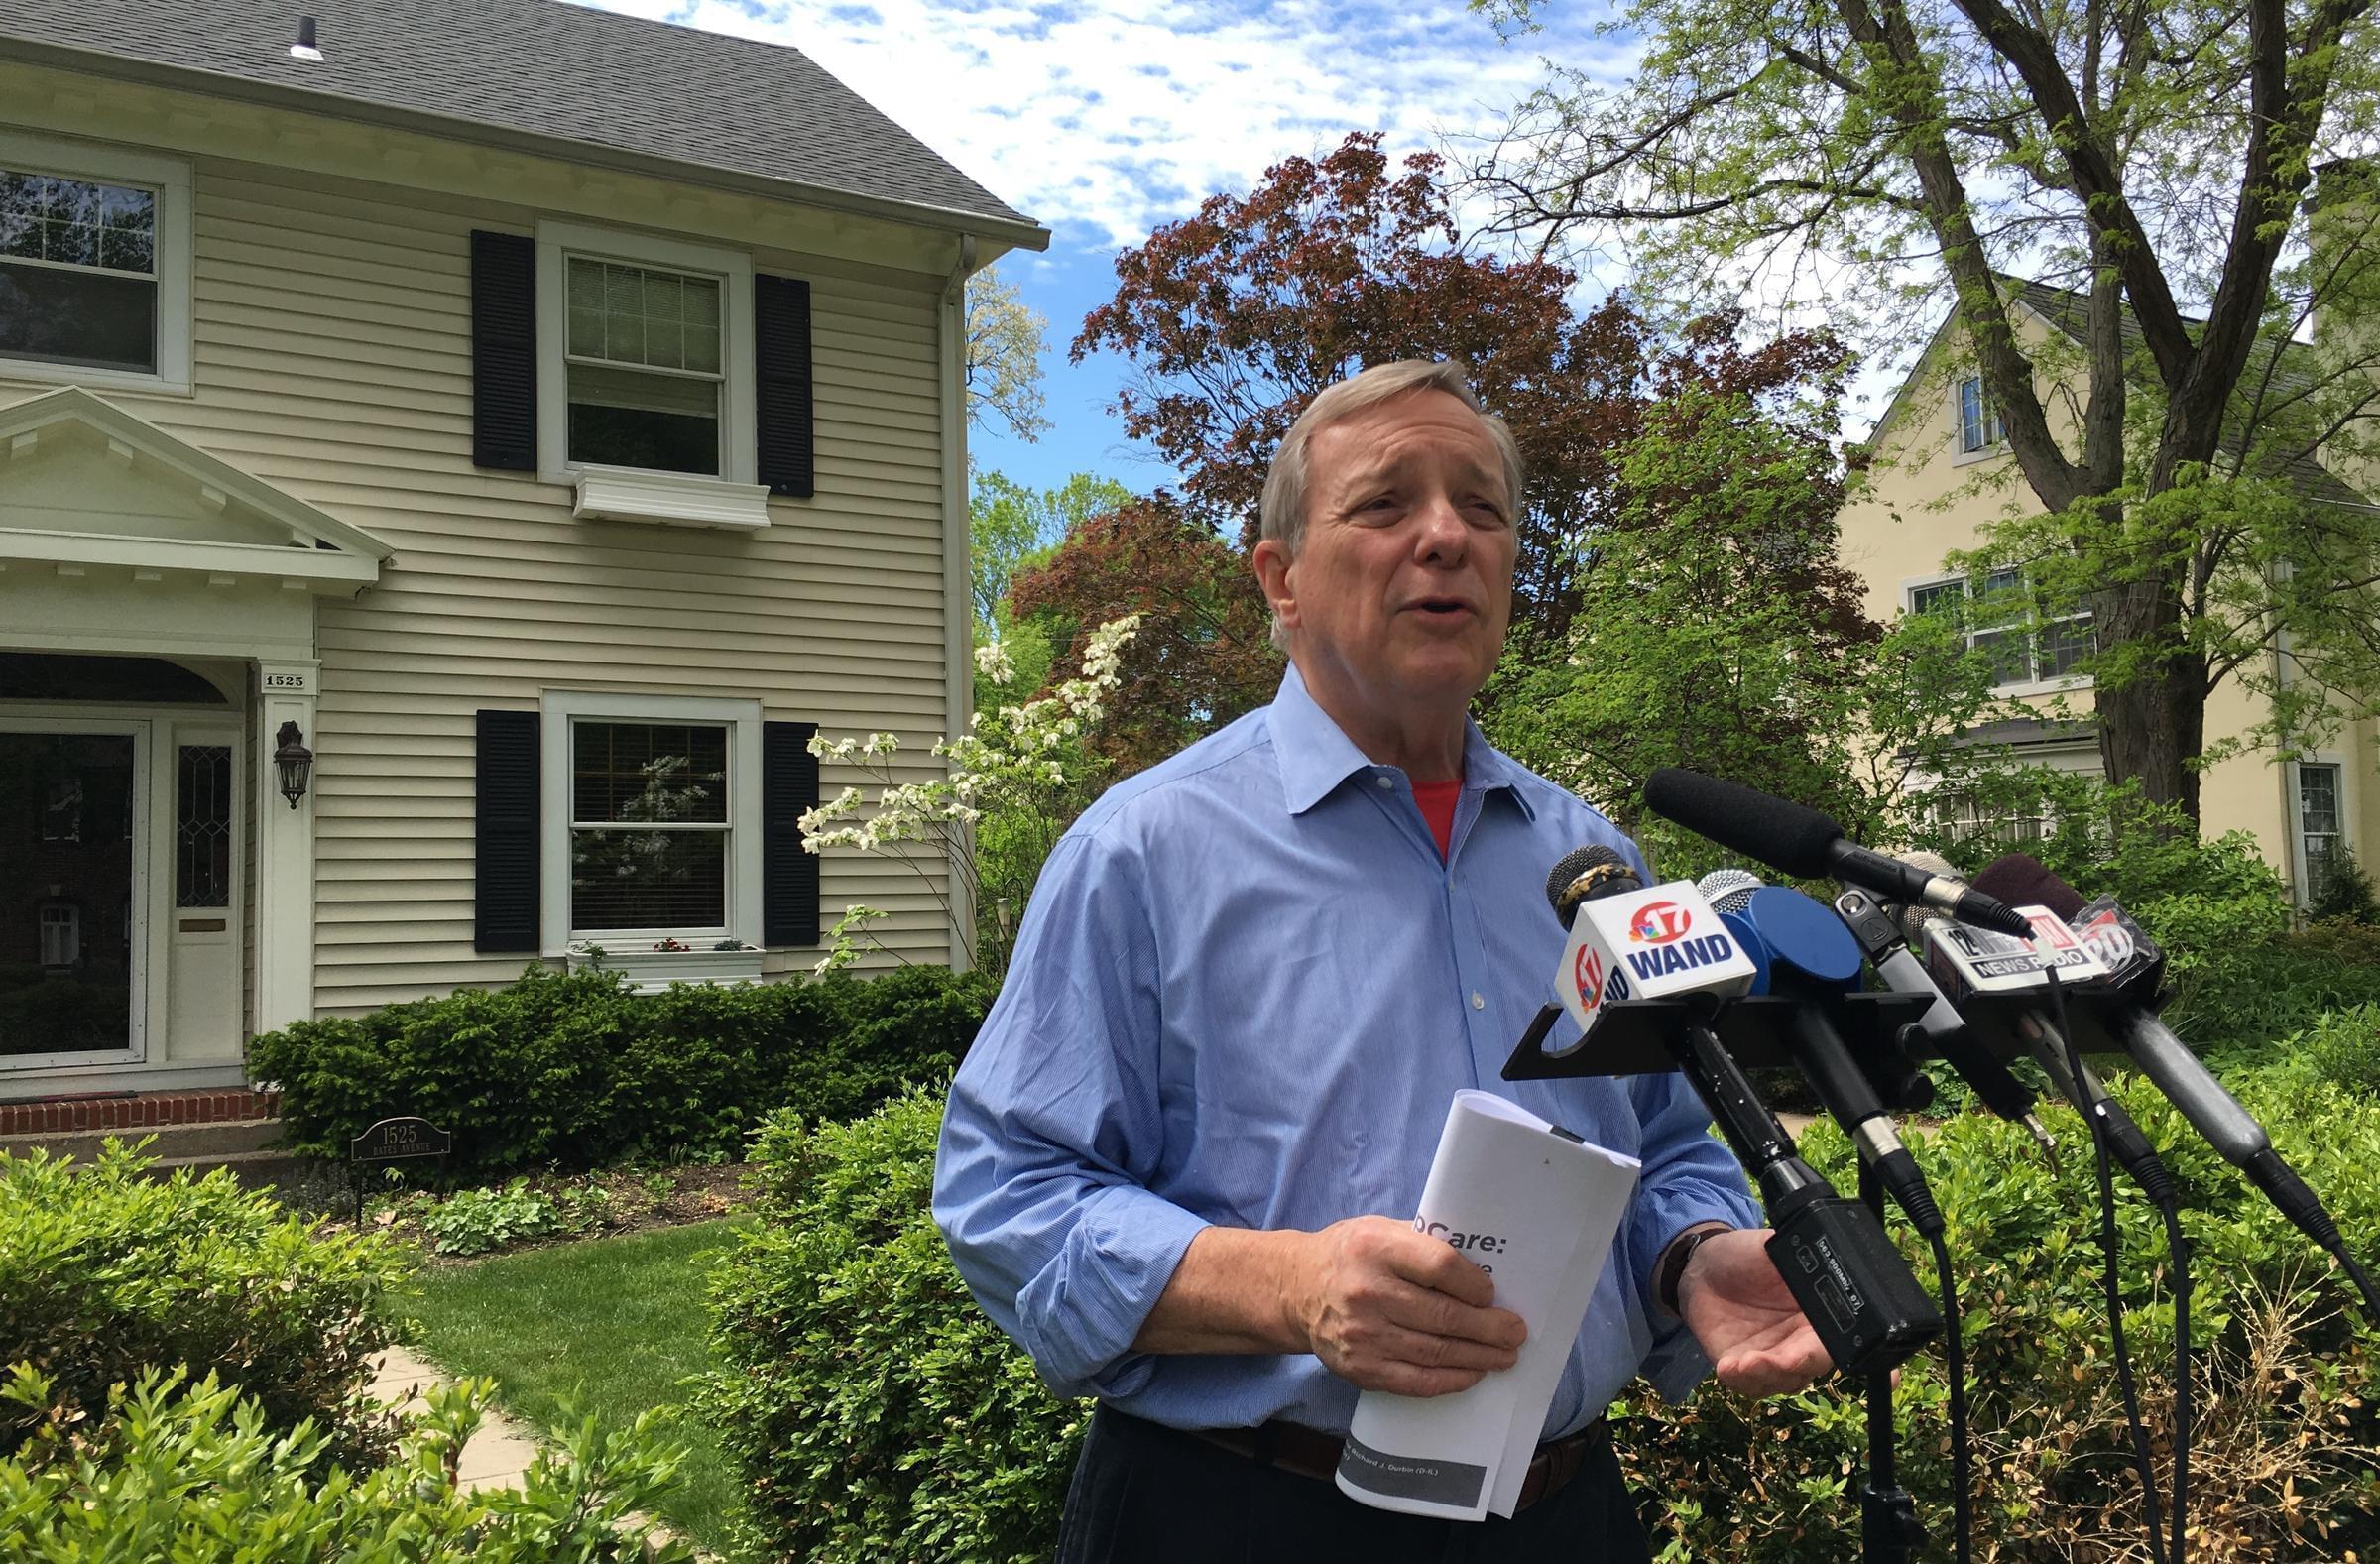 Illinois U.S. Senator Dick Durbin outside his Springfield home